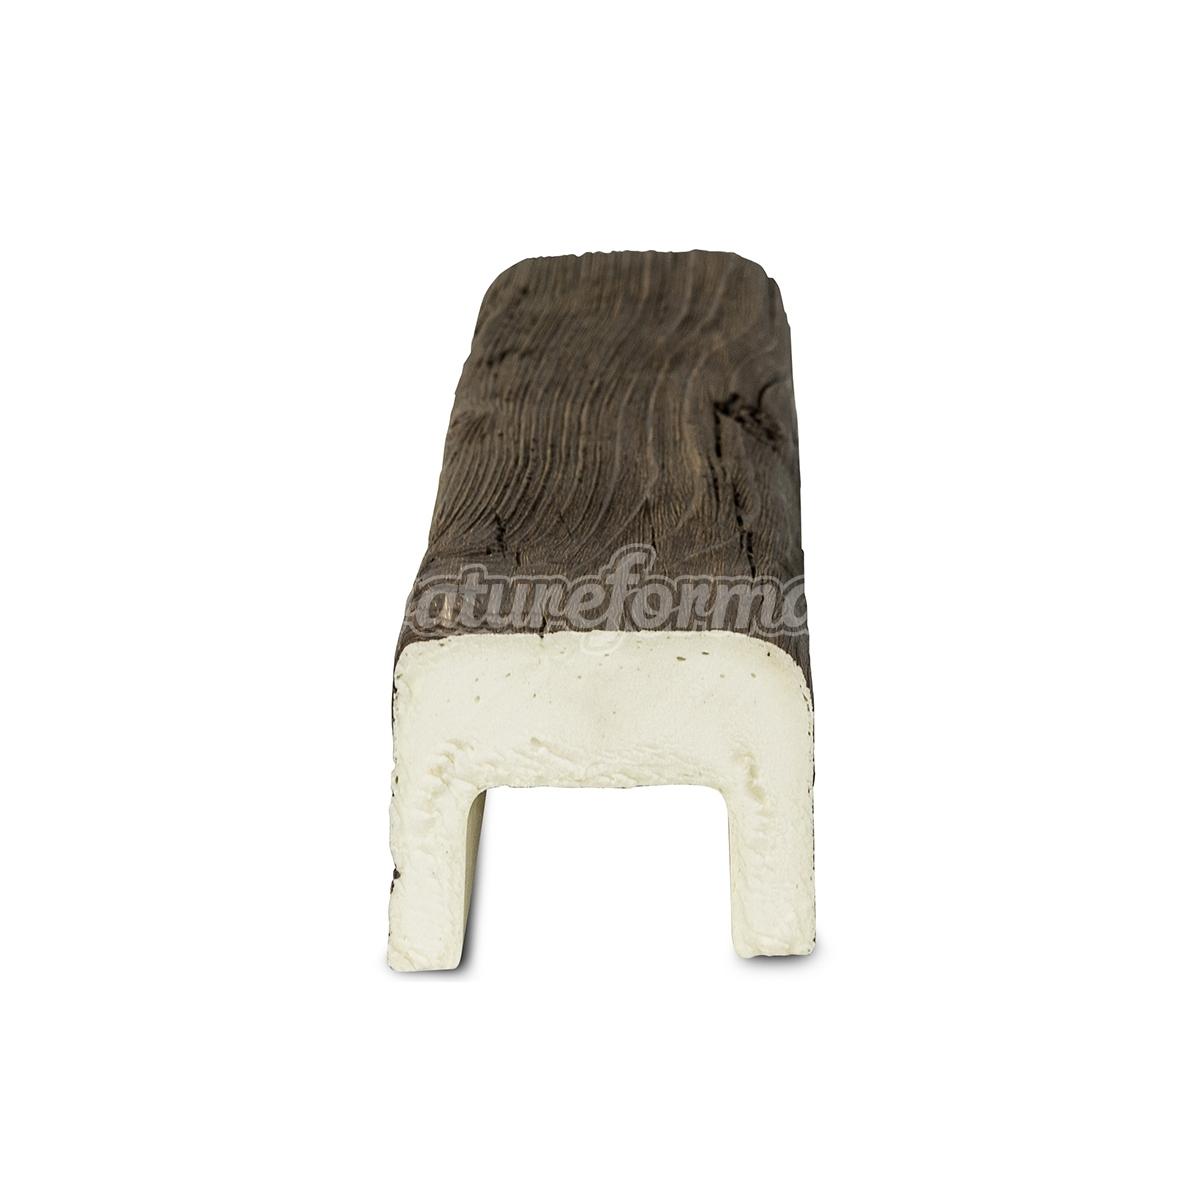 Grupo Unamacor Viga 400x7x5,5 imitación madera